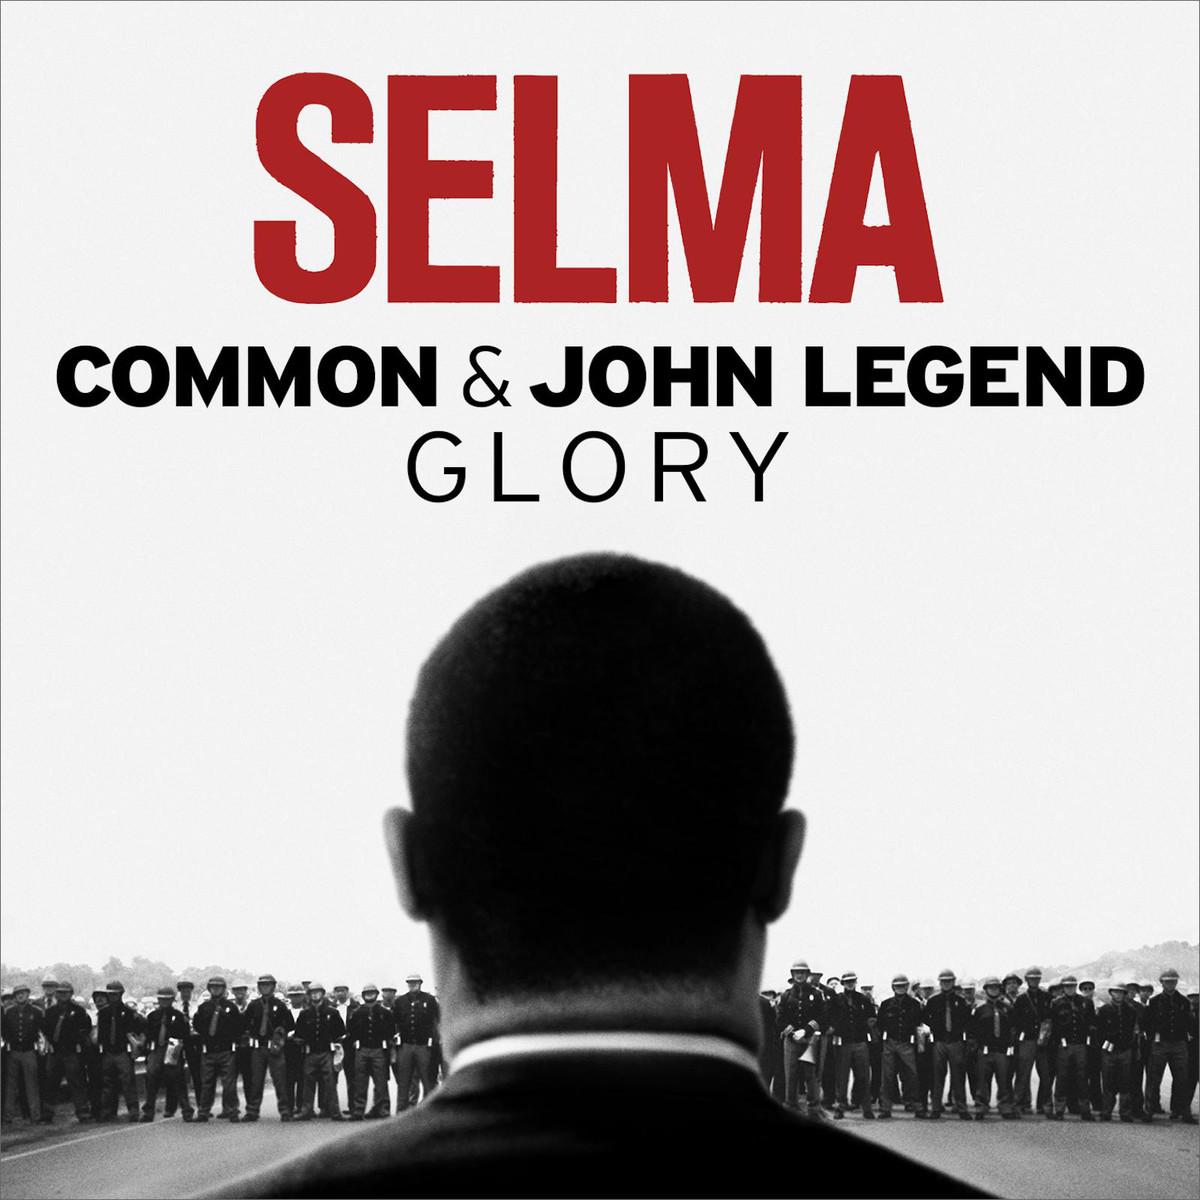 singles in selma John legend on imdb: awards, nominations, and wins.